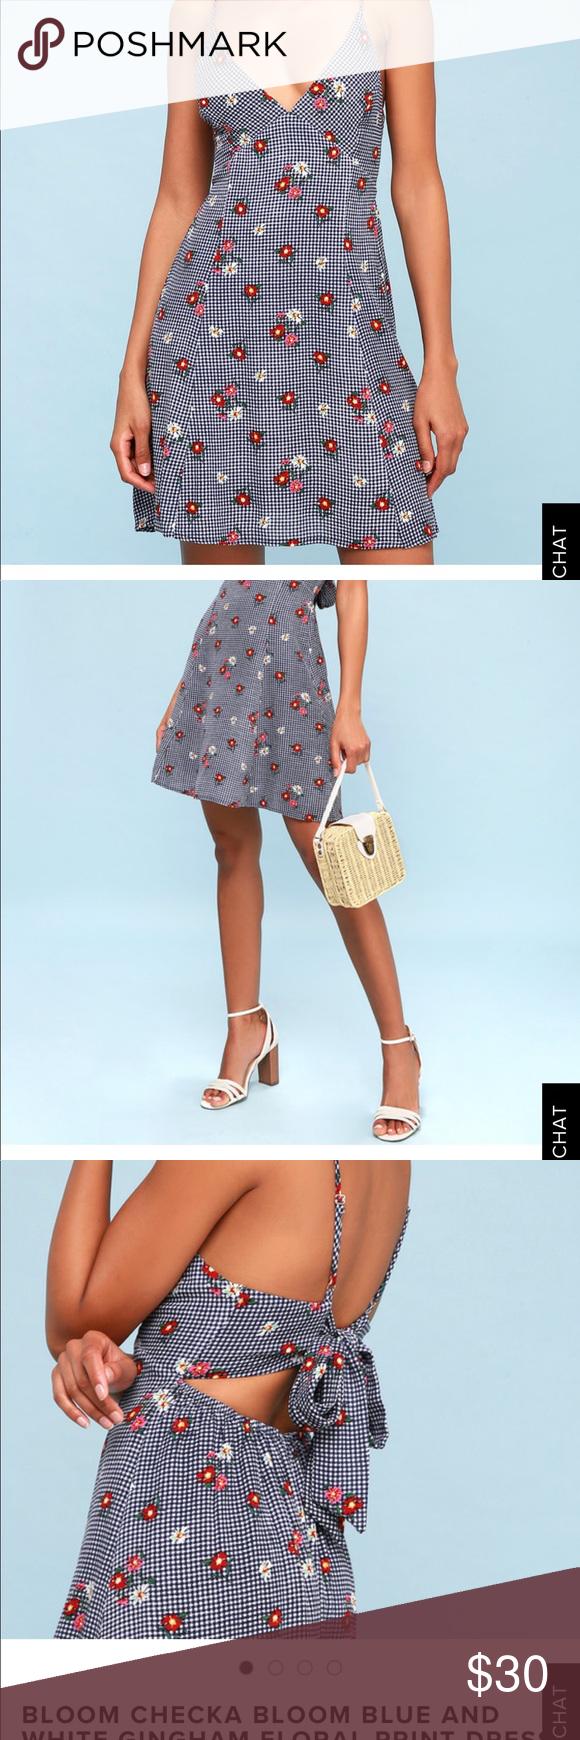 83689b0c570 Lulus floral print dress Lulus - bloom check bloom gingham blue and white  floral print dress